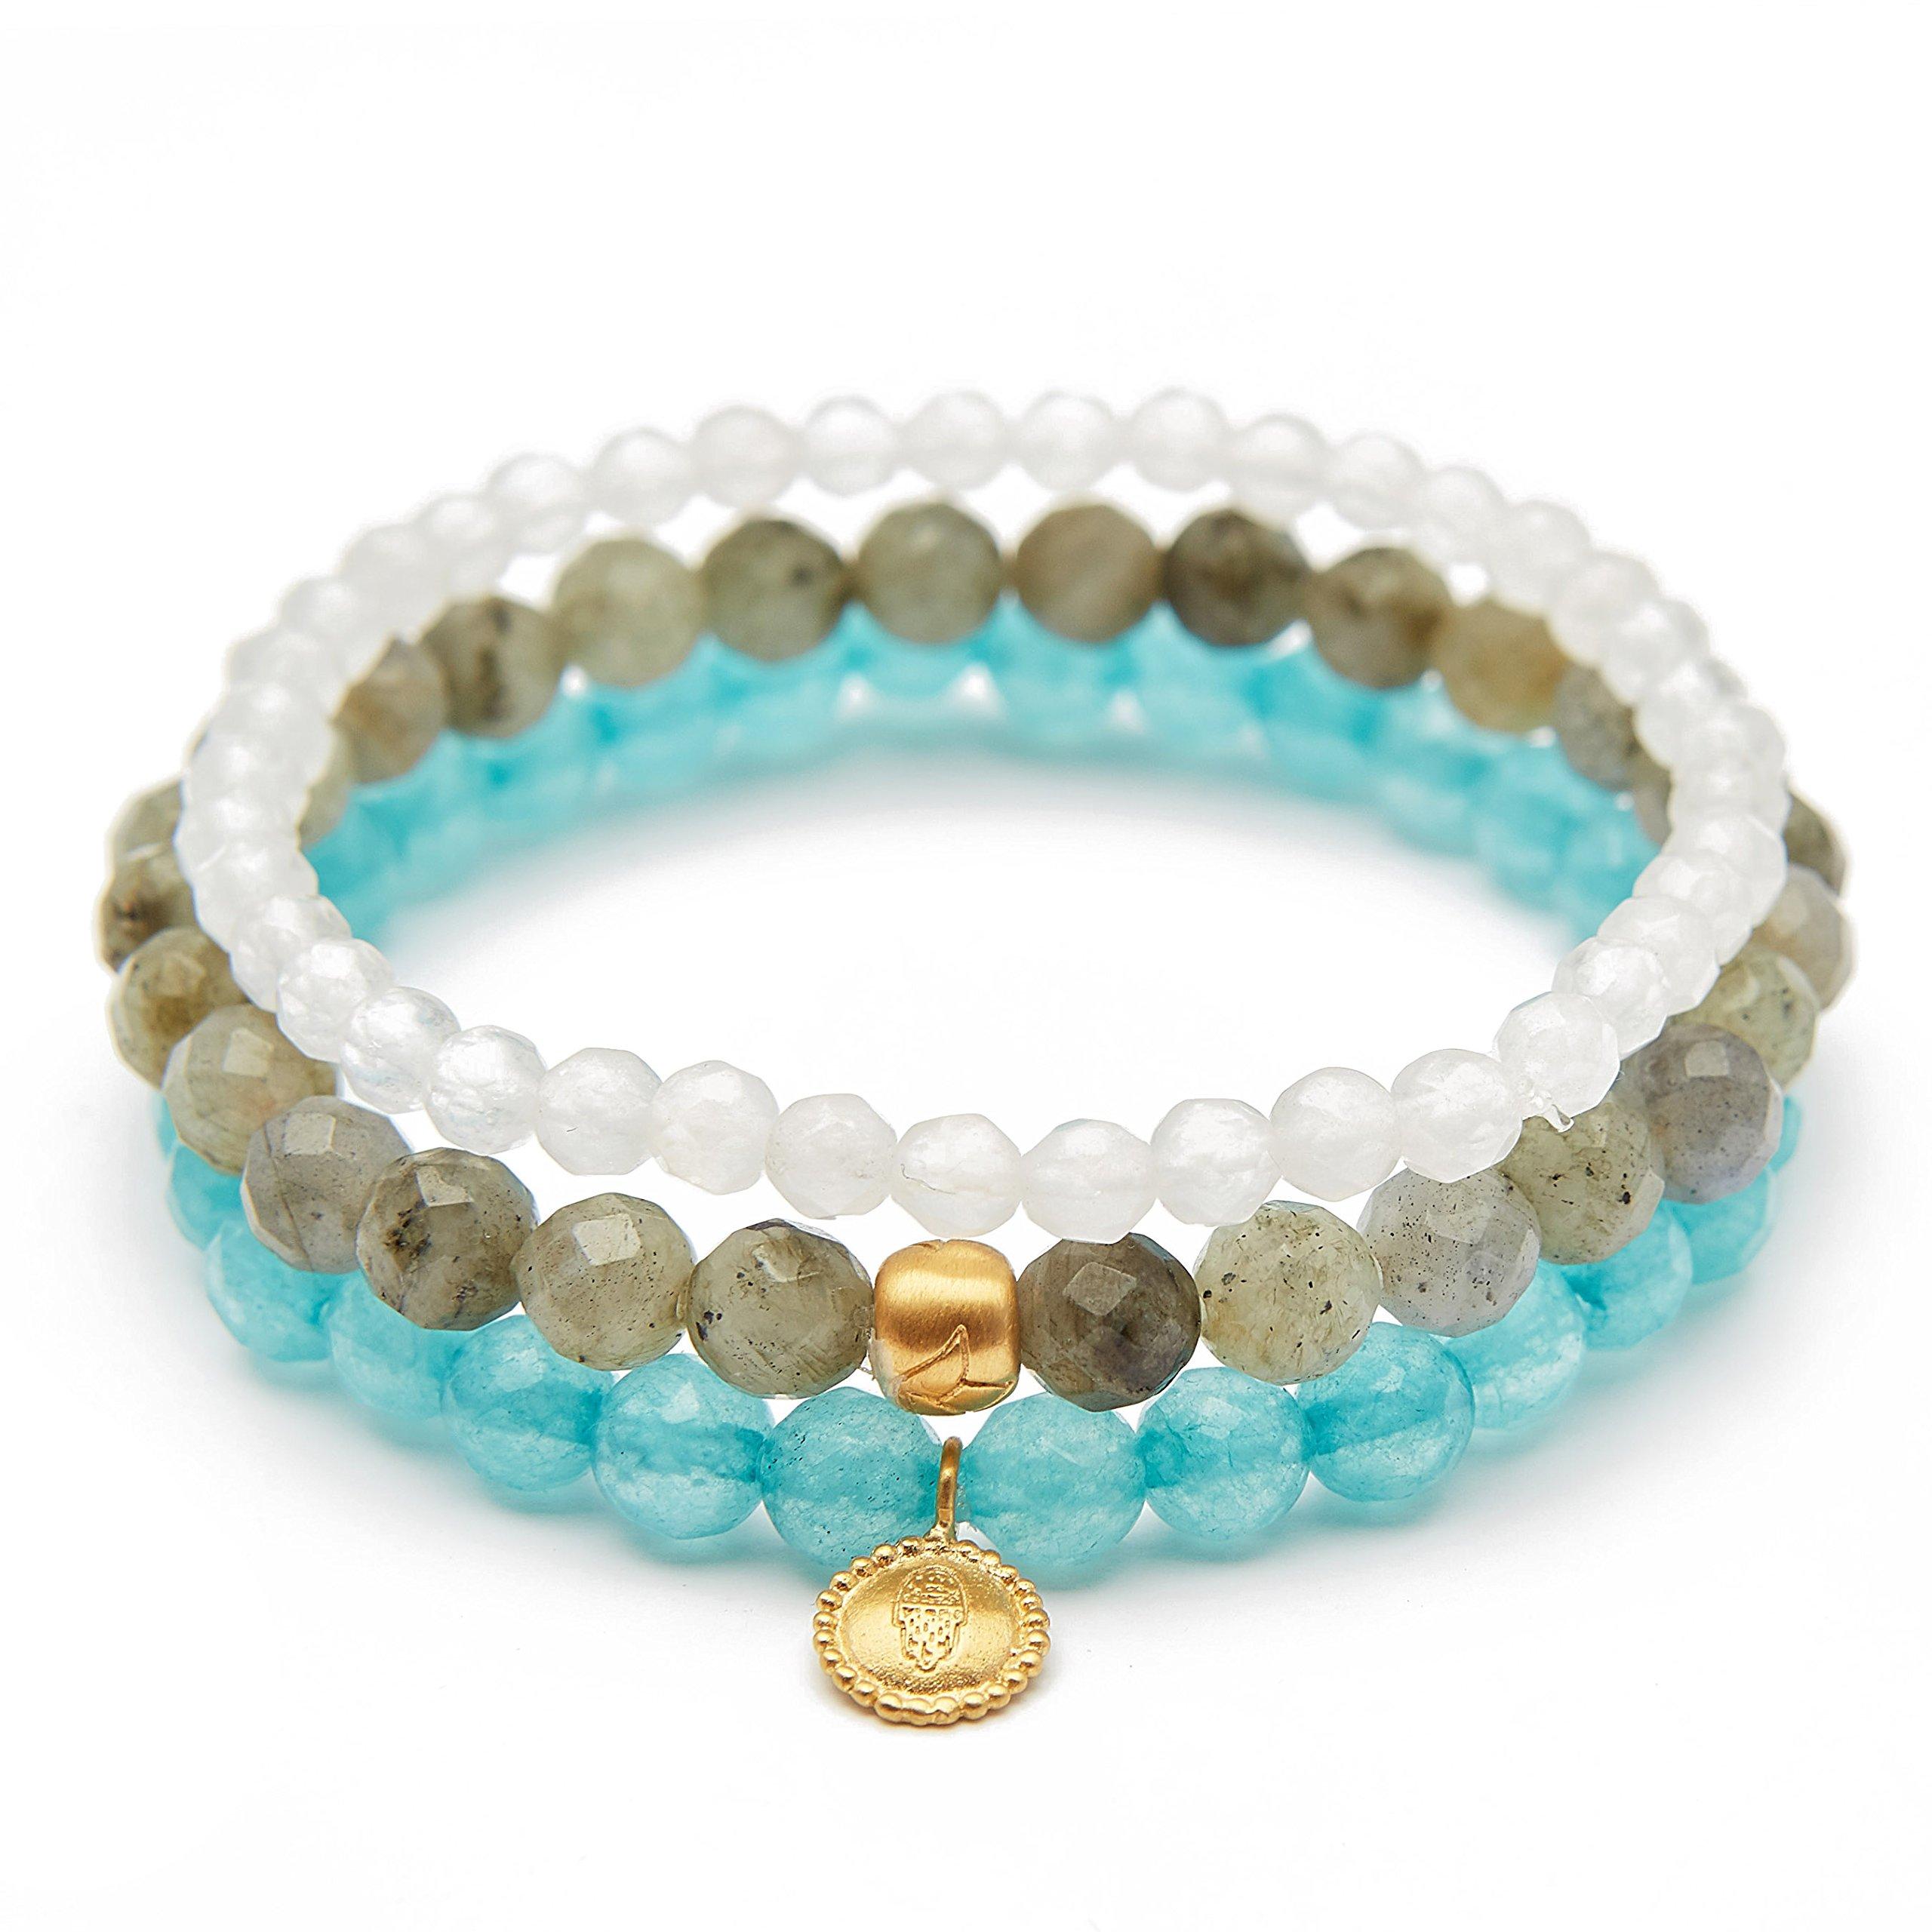 Satya Jewelry Women's Labradorite Angelite White Jade Gold Hamsa Lotus Stretch Bracelet Set, Multi, One Size